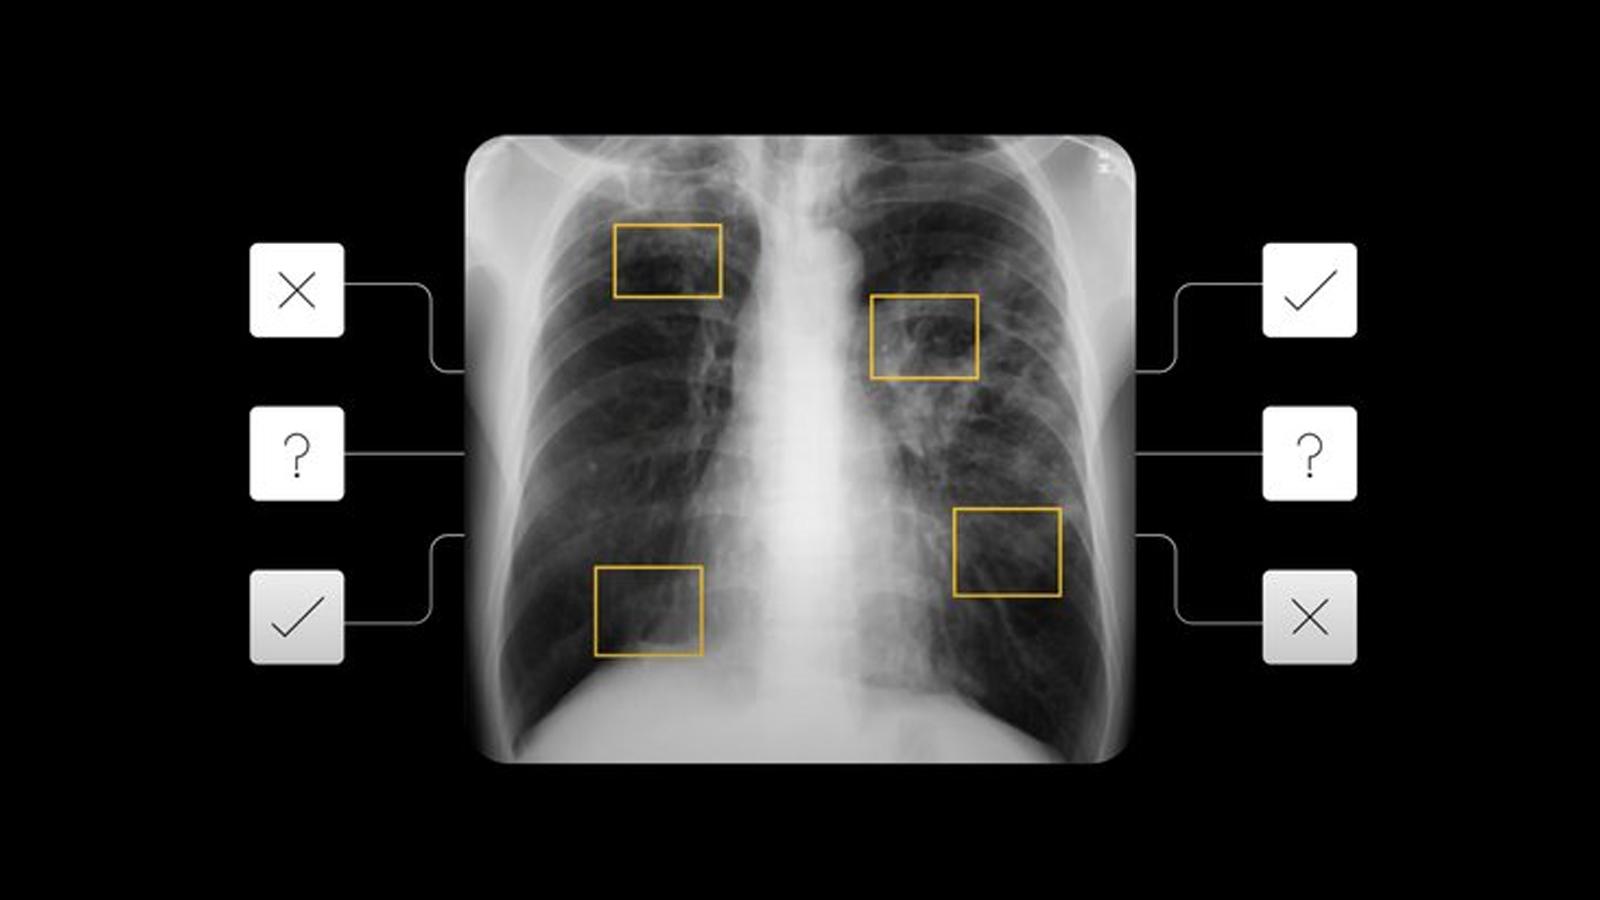 Google's AI tech helping screen tuberculosis x-rays